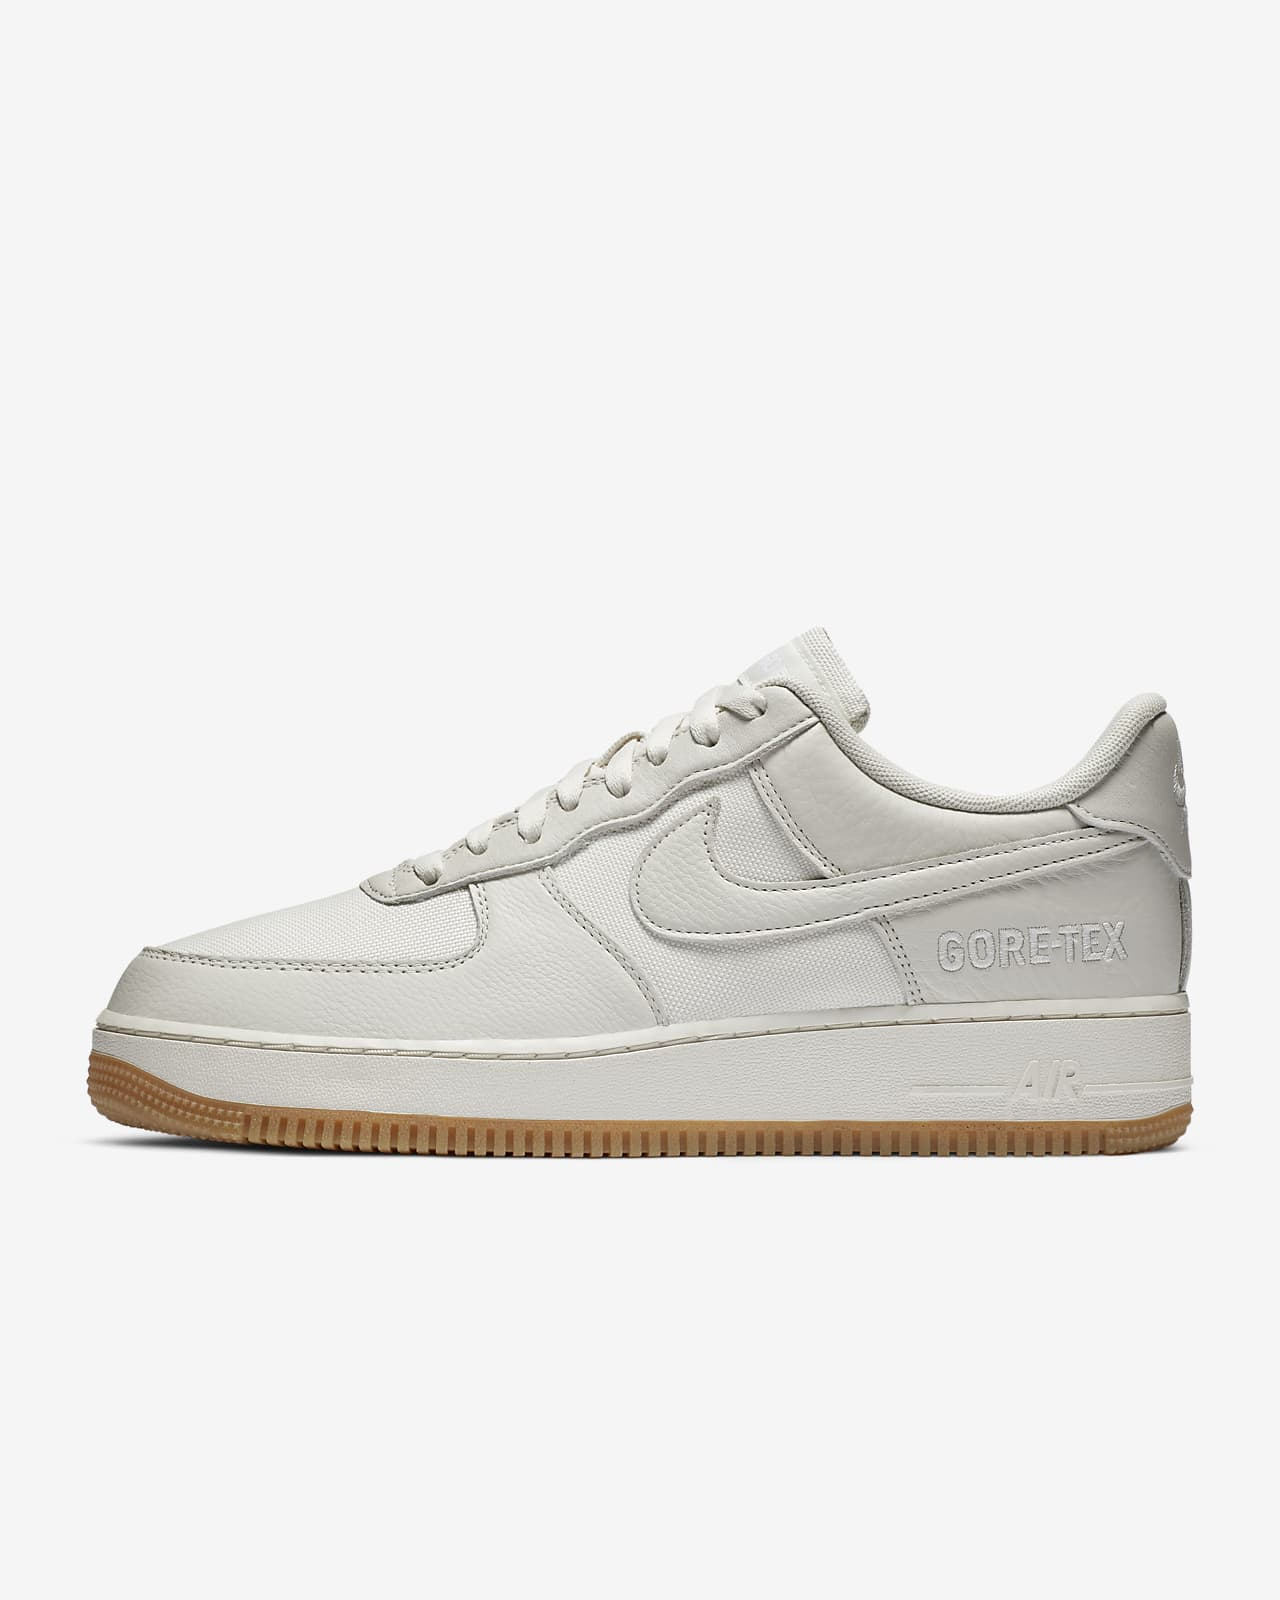 Nike Air Force 1 Low GORE-TEX férficipő